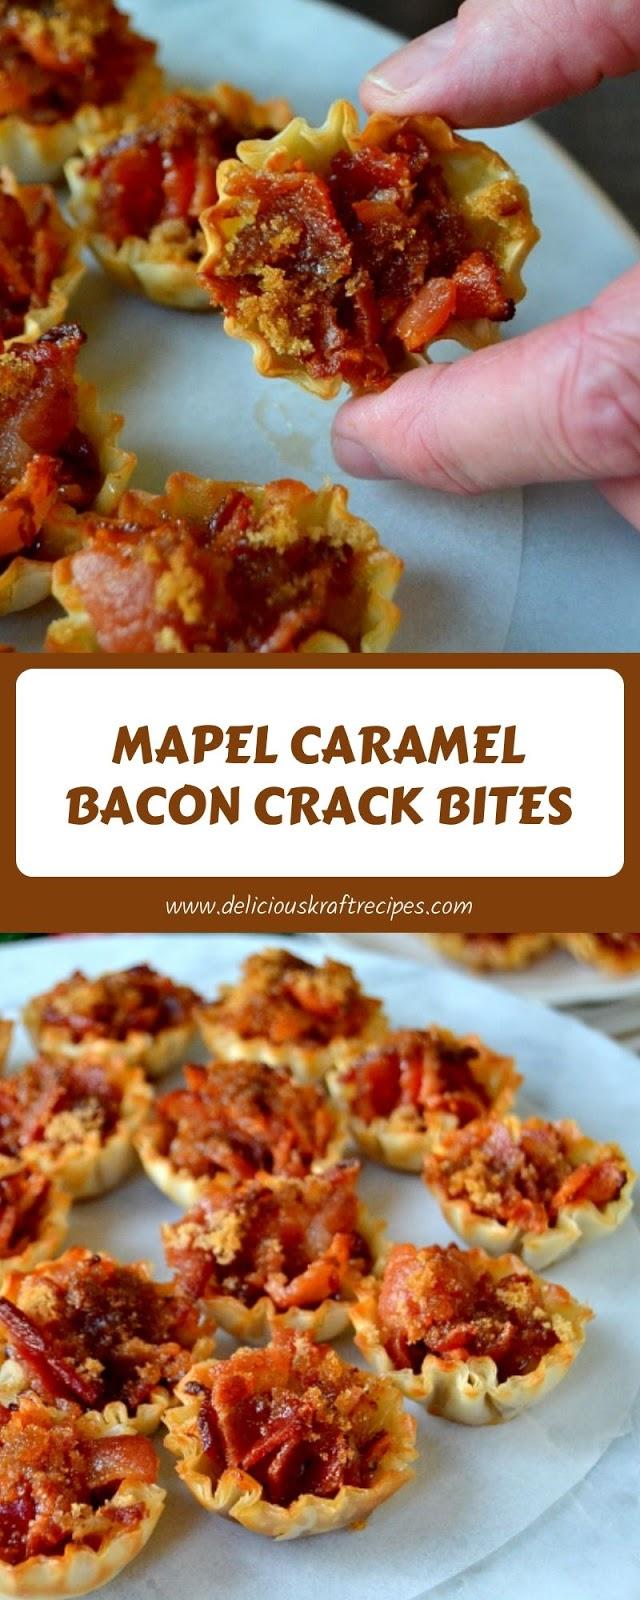 MAPEL CARAMEL BACON CRACK BITES